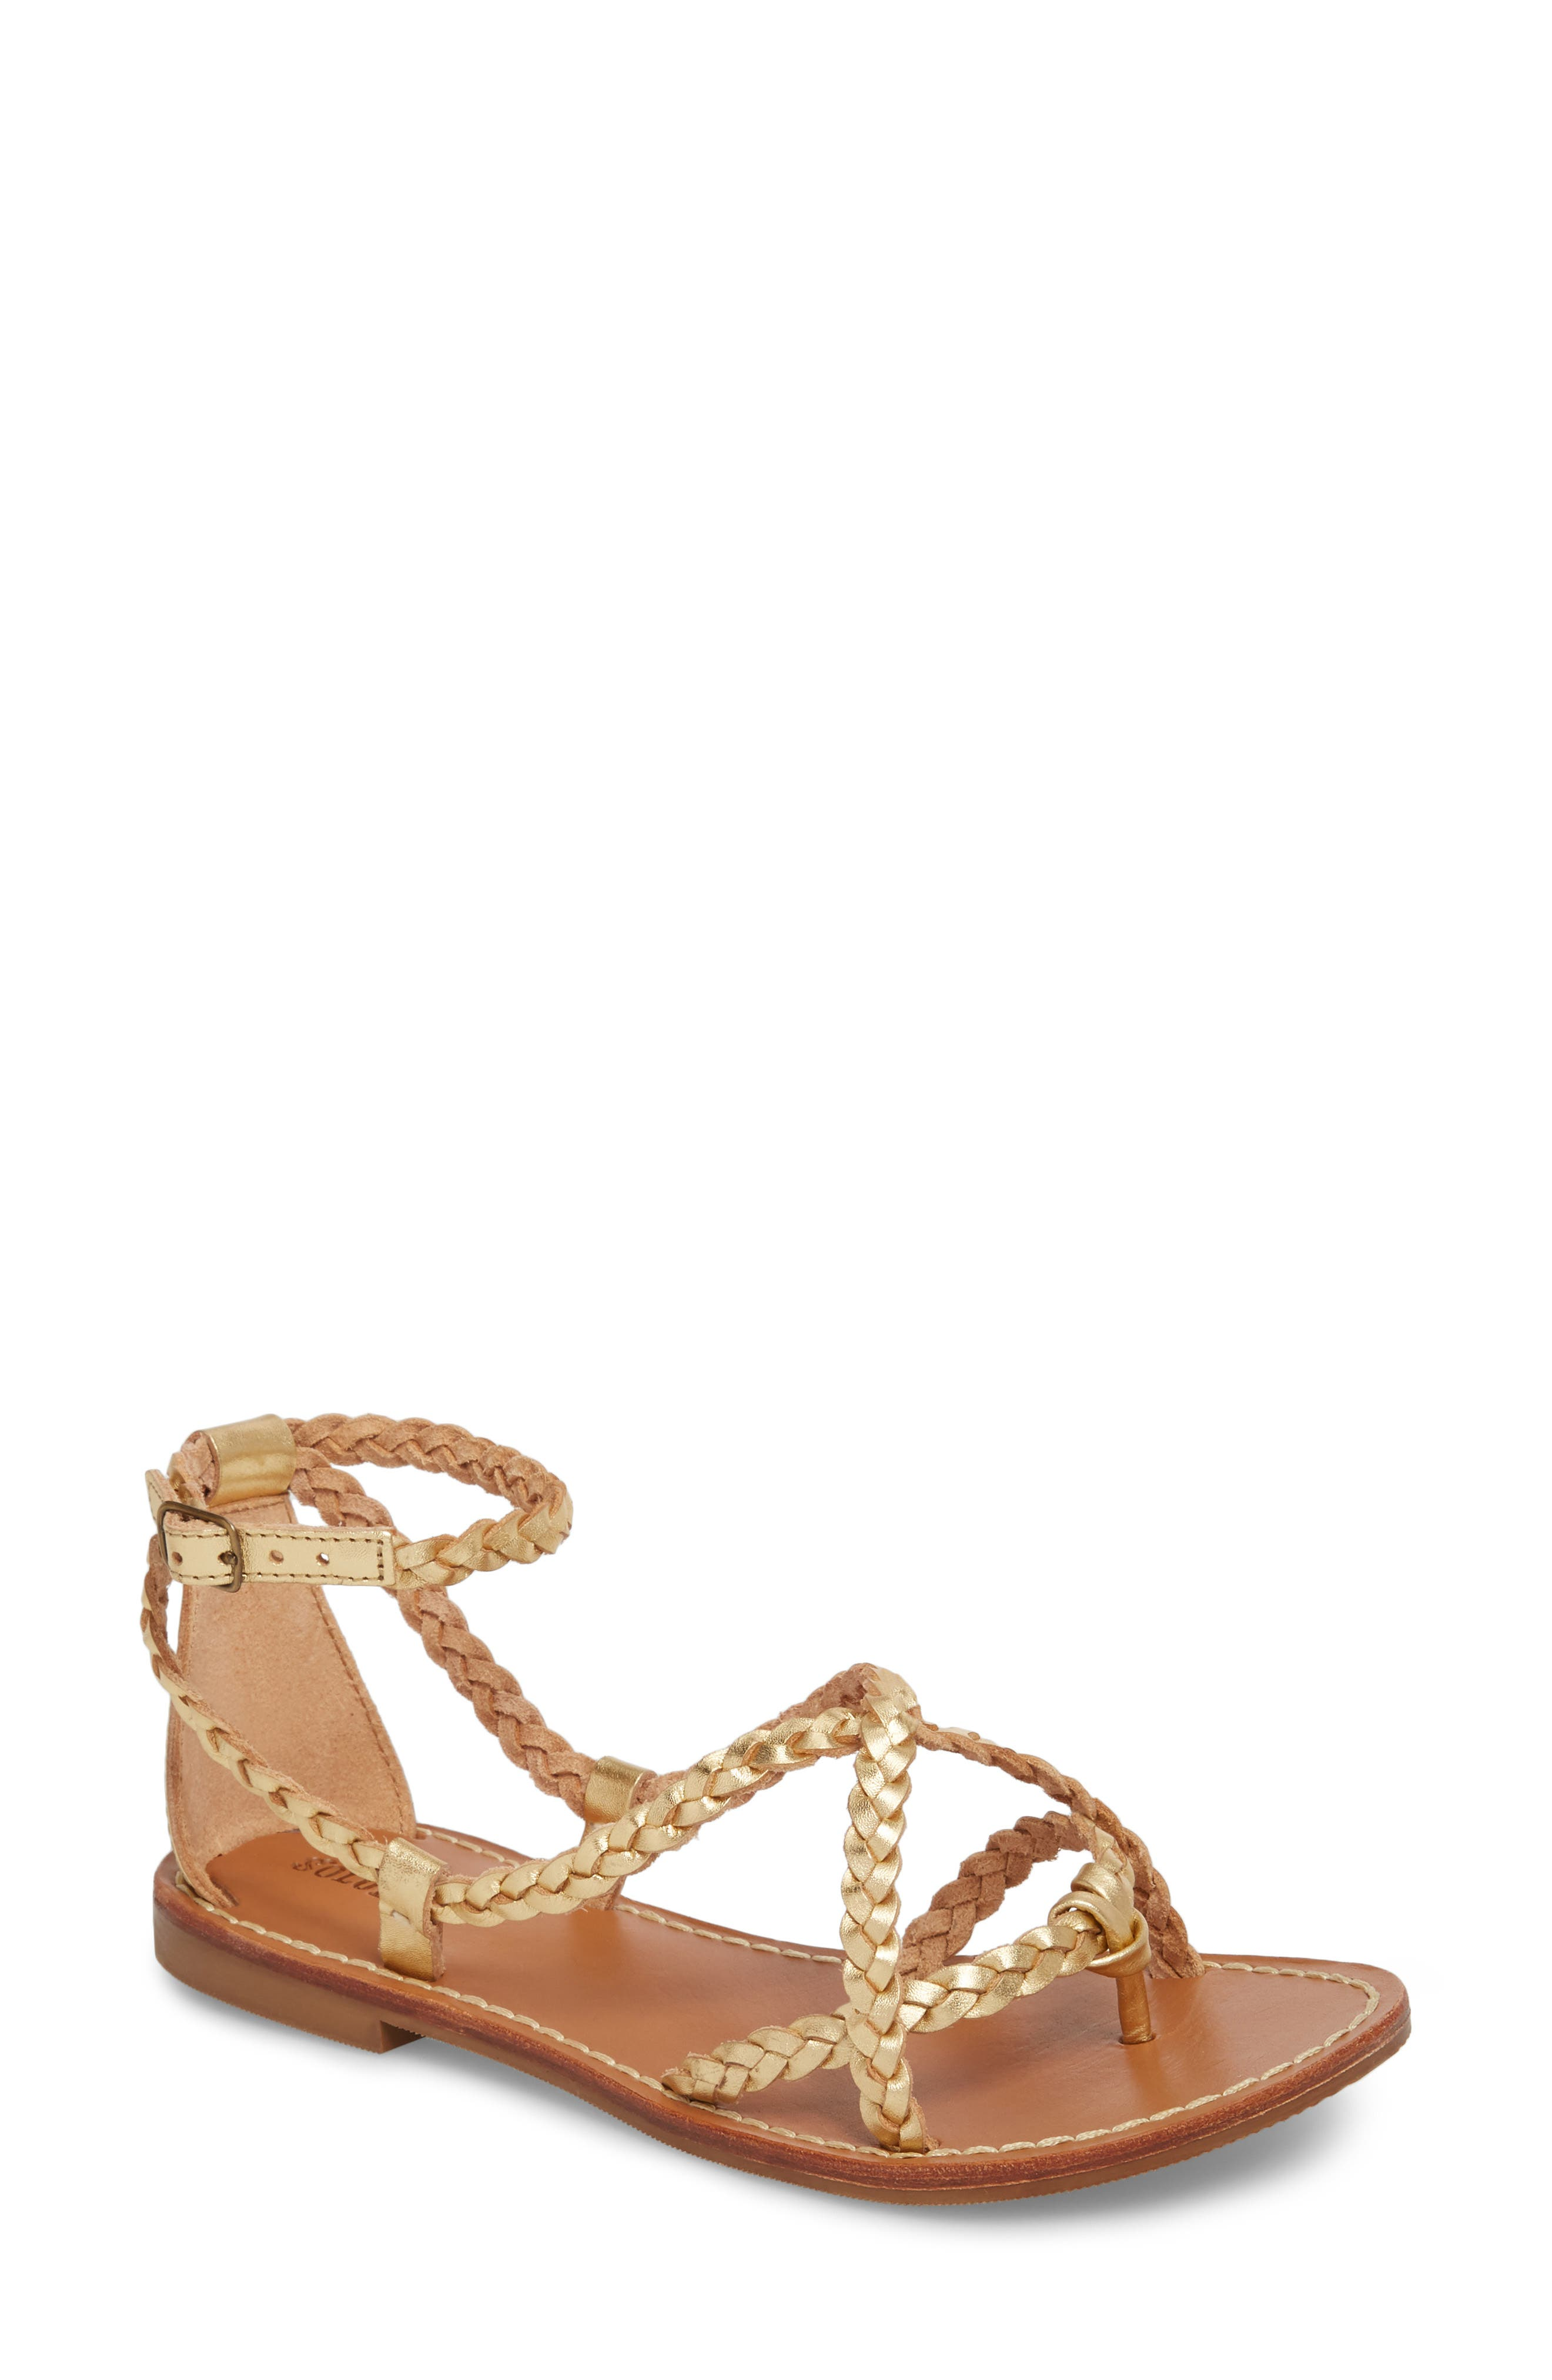 Amalfi Braided Metallic Sandal,                         Main,                         color, Gold Leather